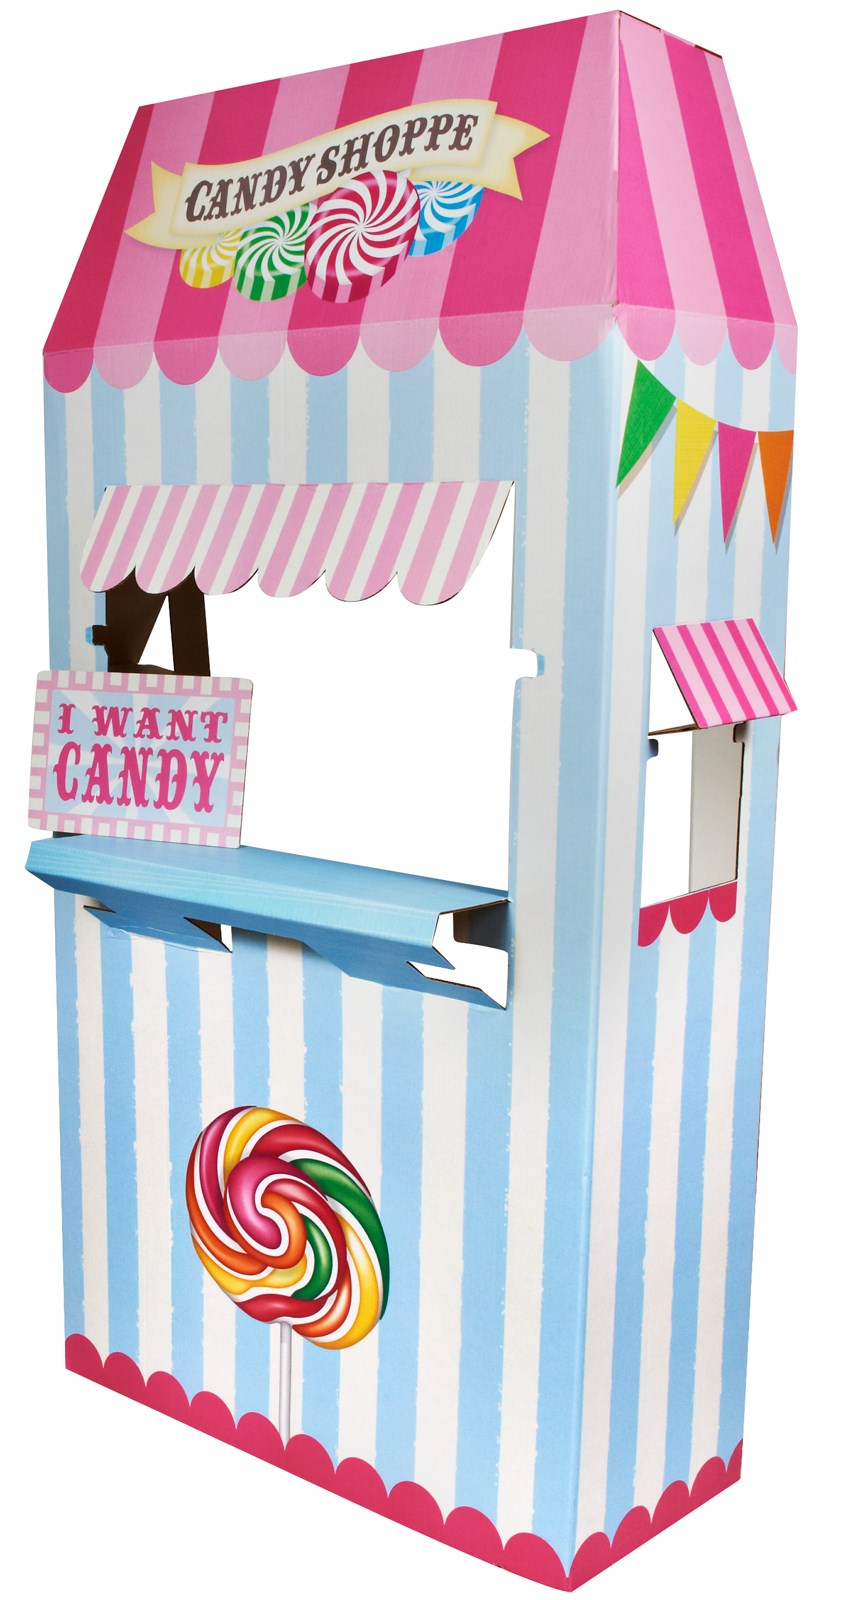 Candy Shoppe Cardboard Stand - 6' Tall | BirthdayExpress.com